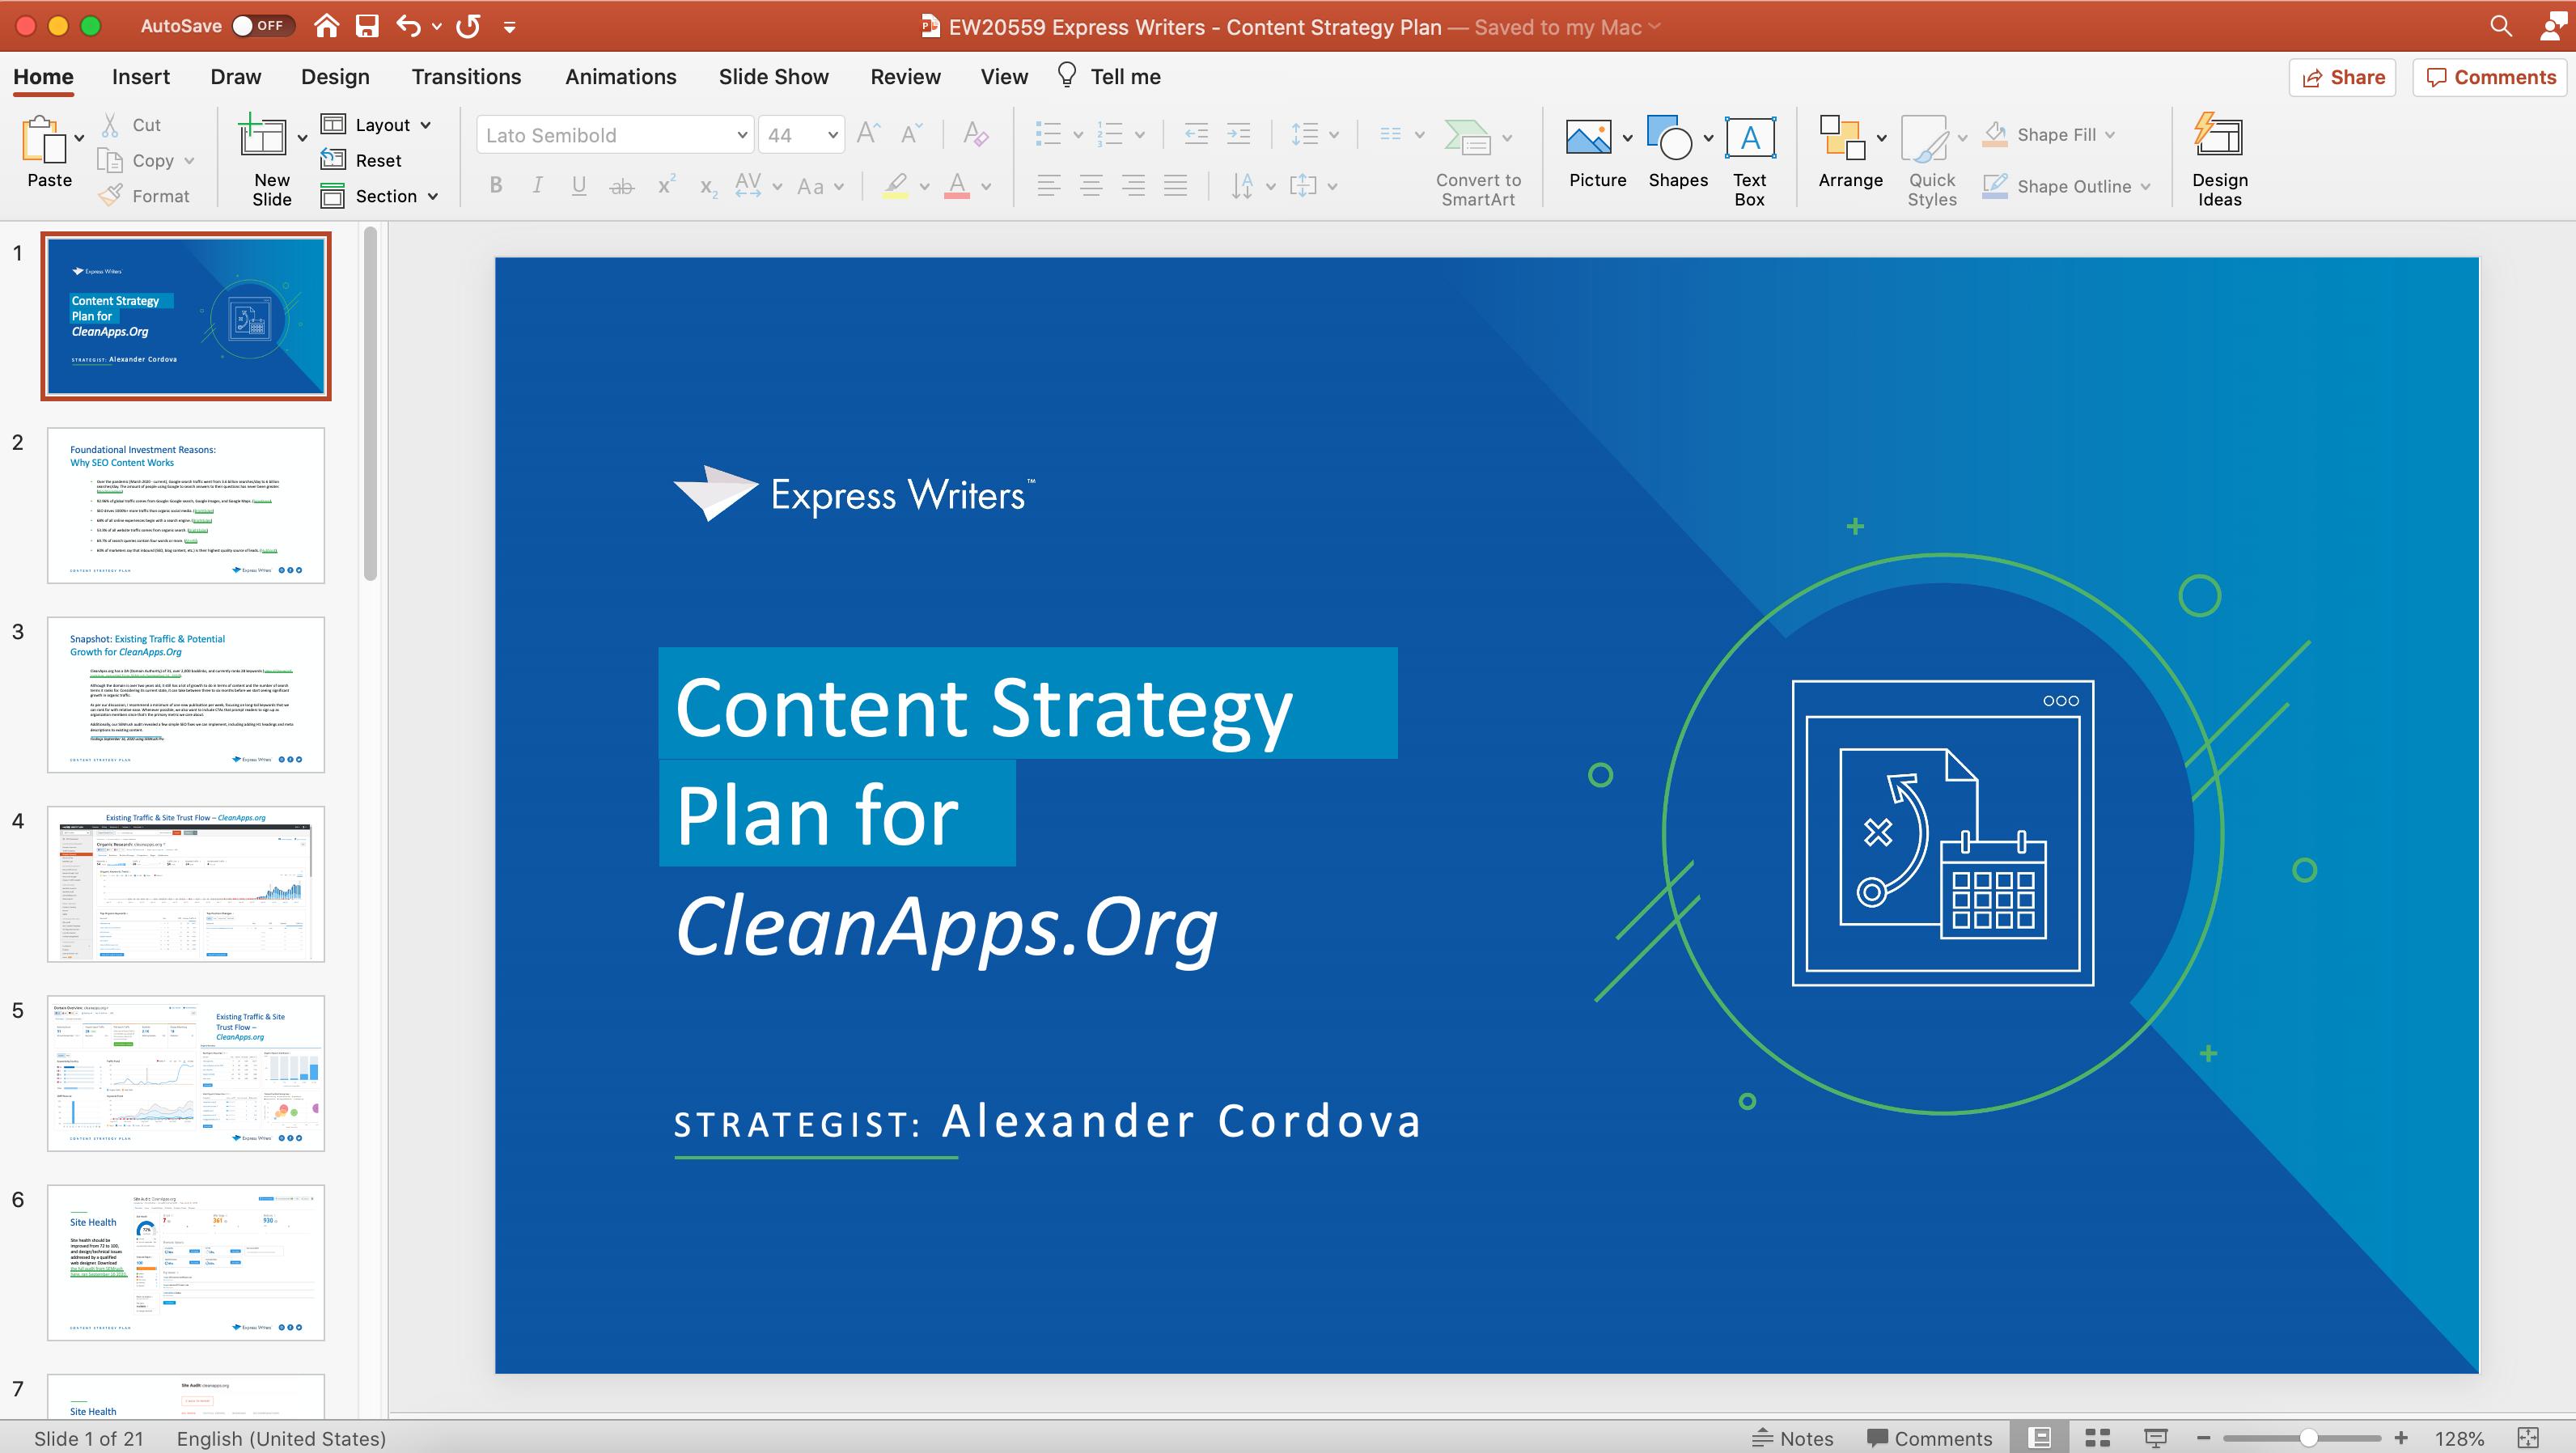 EW content strategy plan